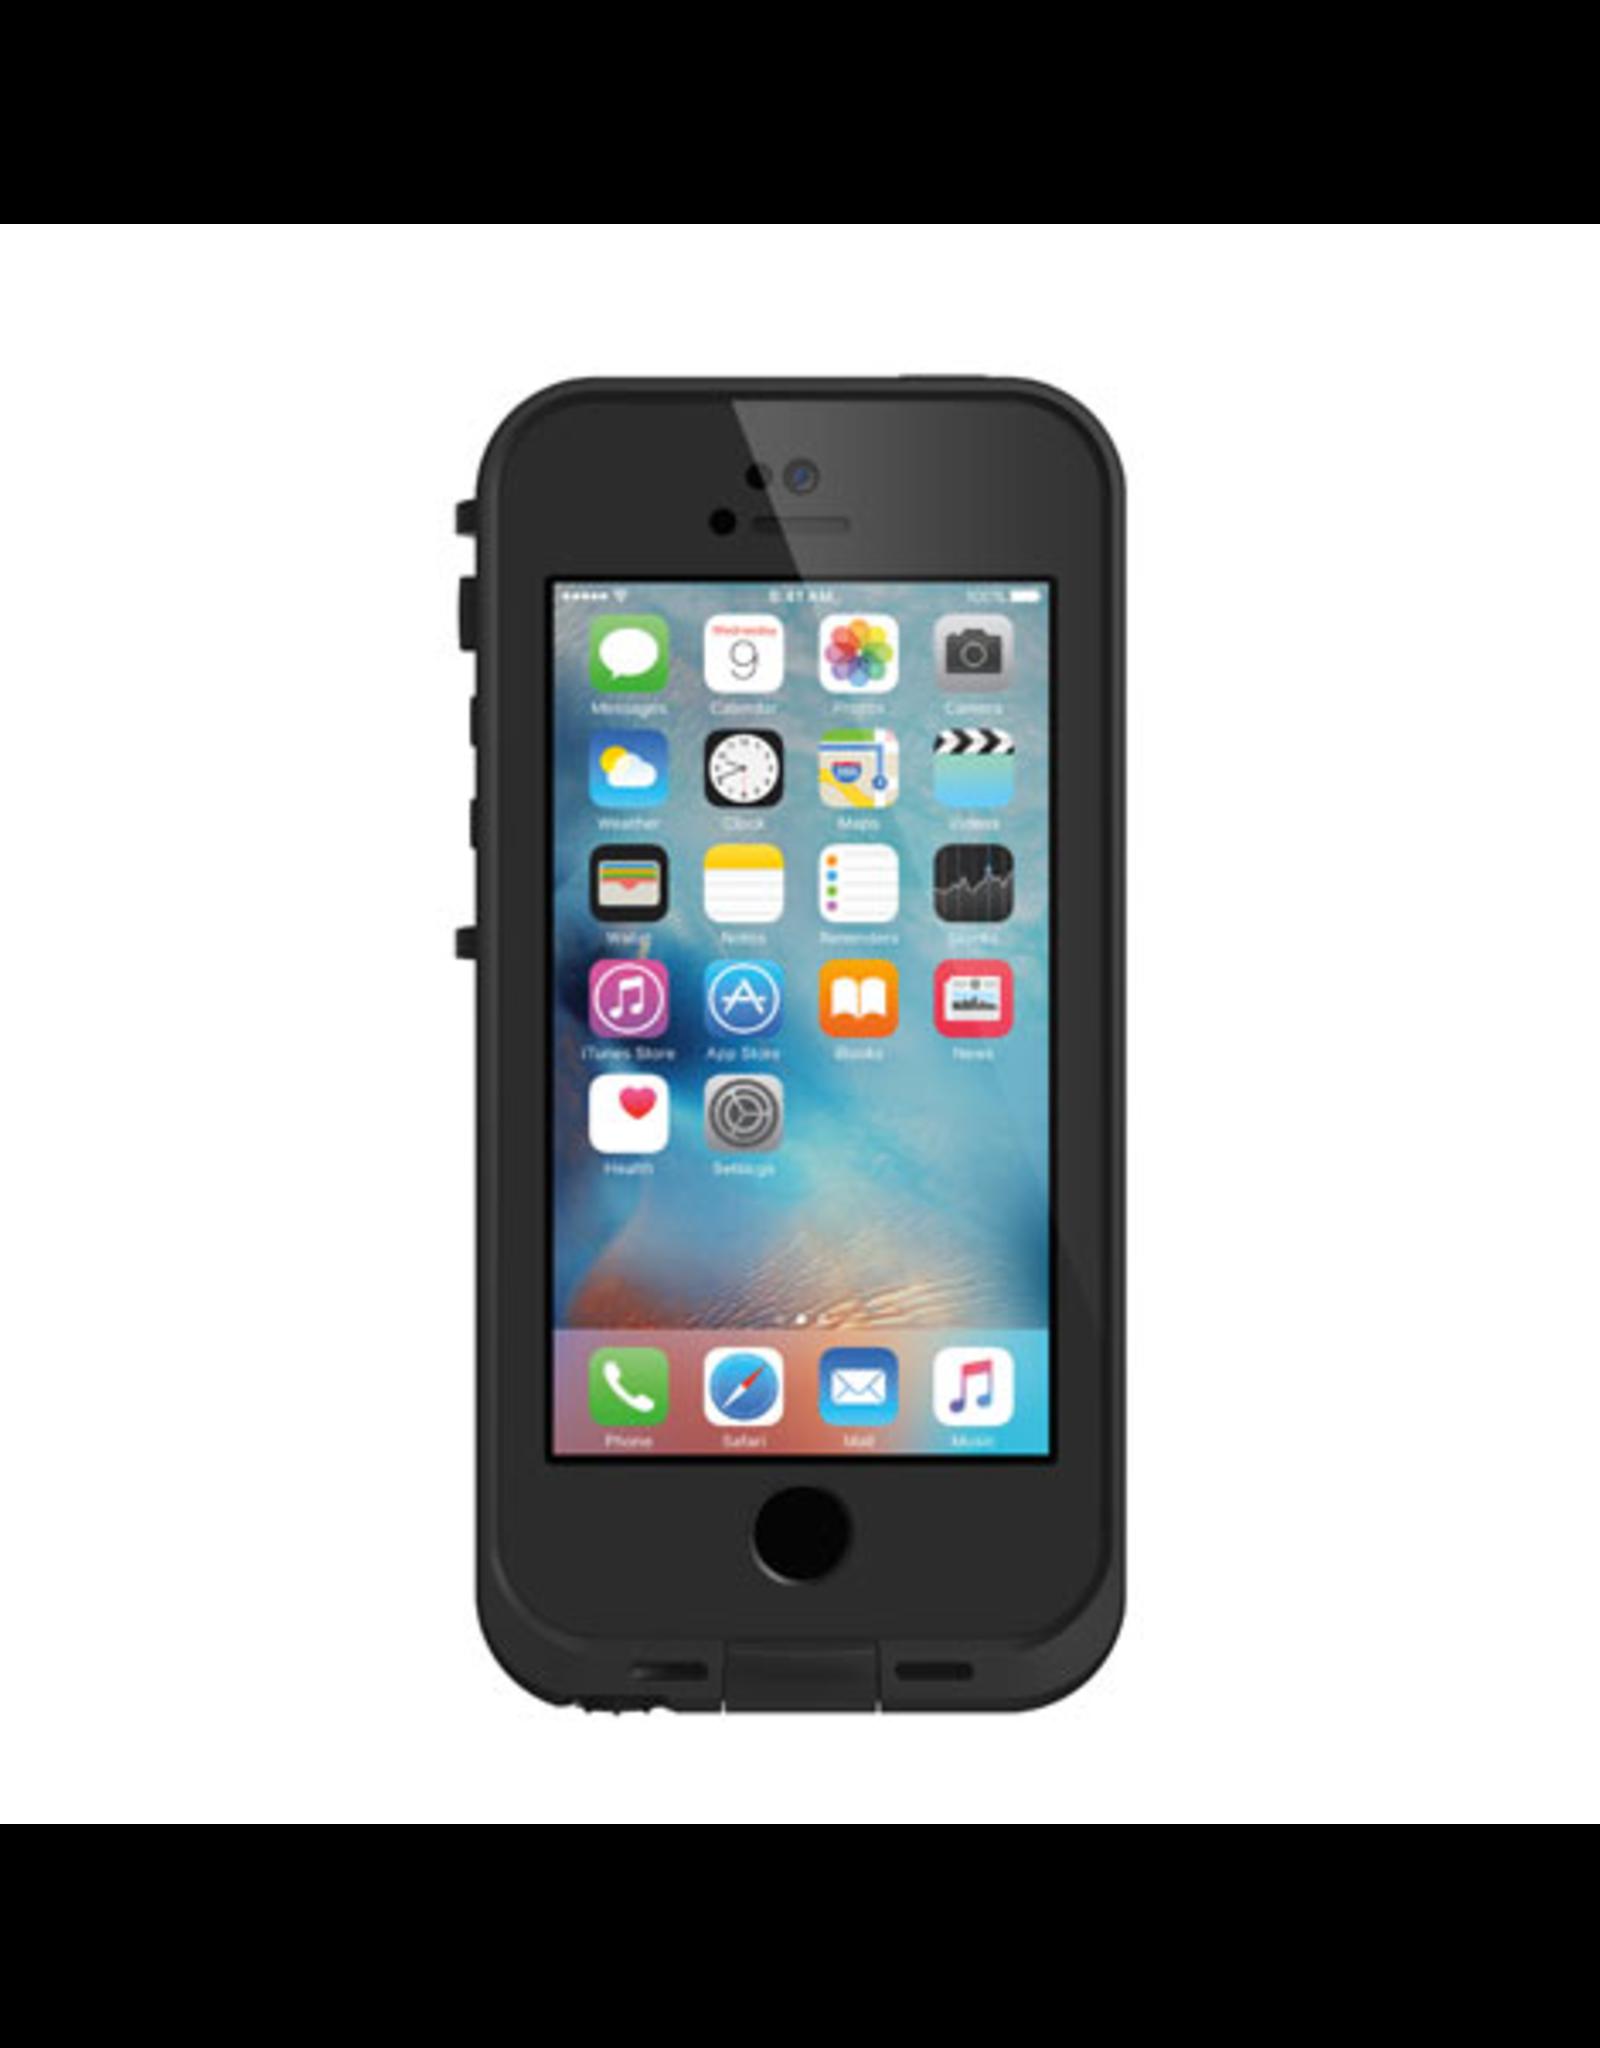 Lifeproof LifeProof Fre Case suits iPhone 5/5S/SE - Black